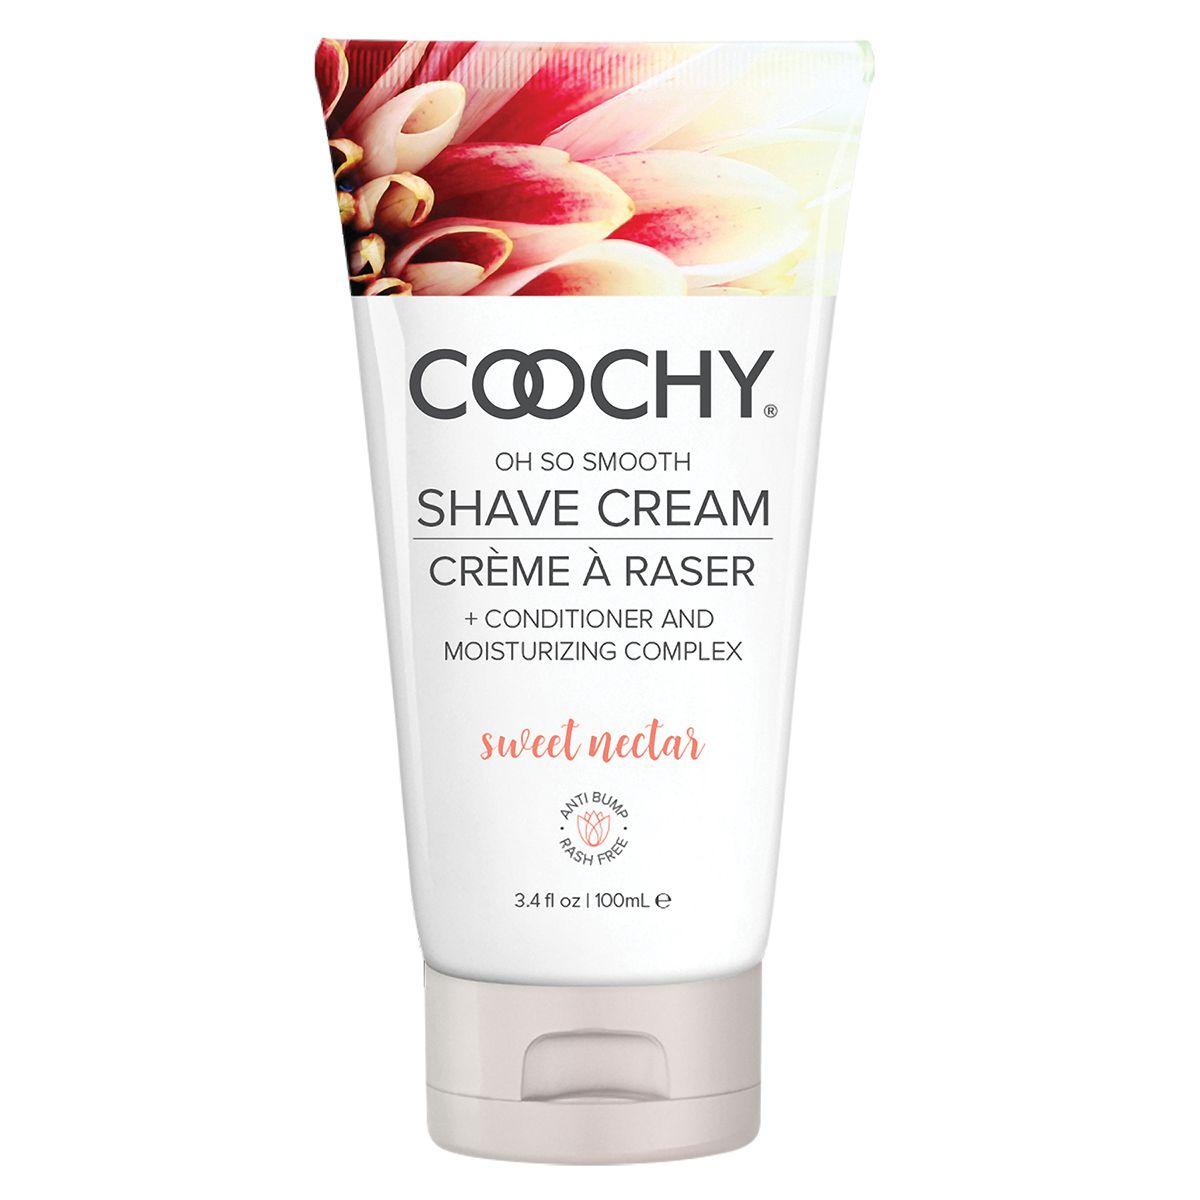 Увлажняющий комплекс COOCHY Sweet Nectar - 100 мл. фото